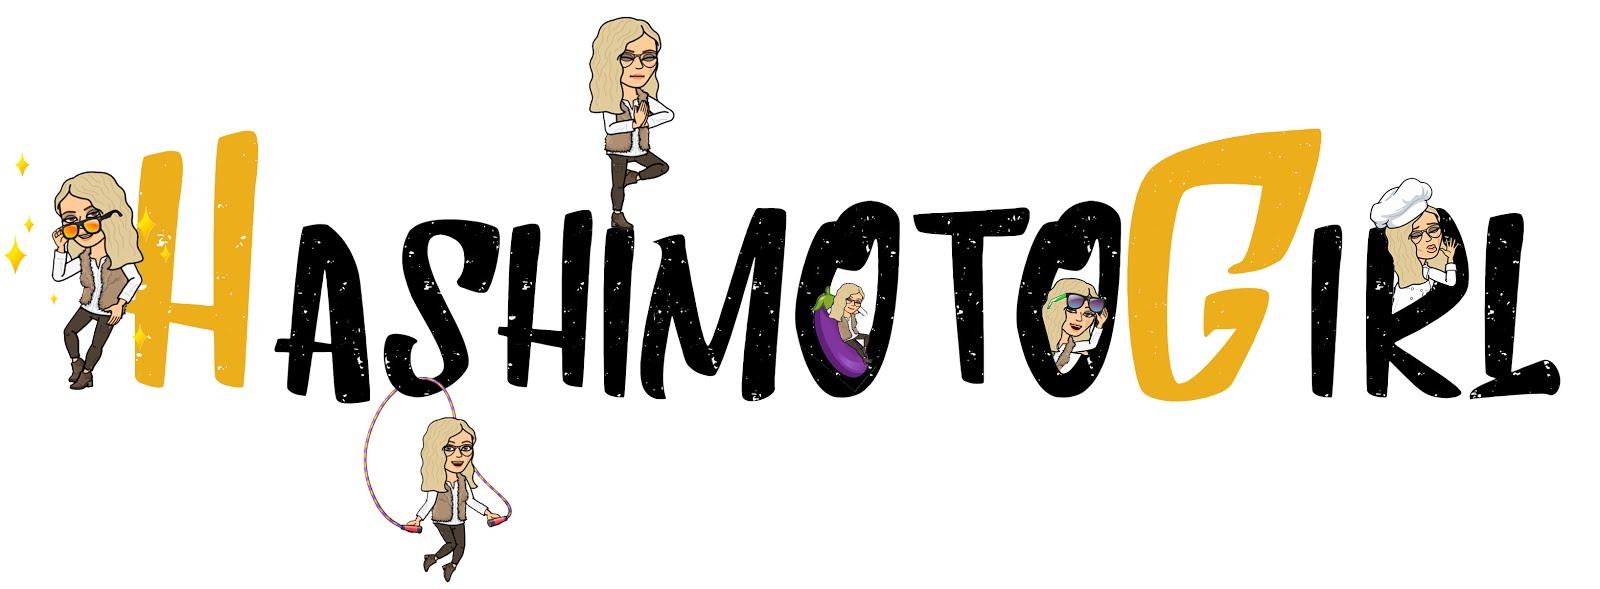 Hashimotogirl.pl